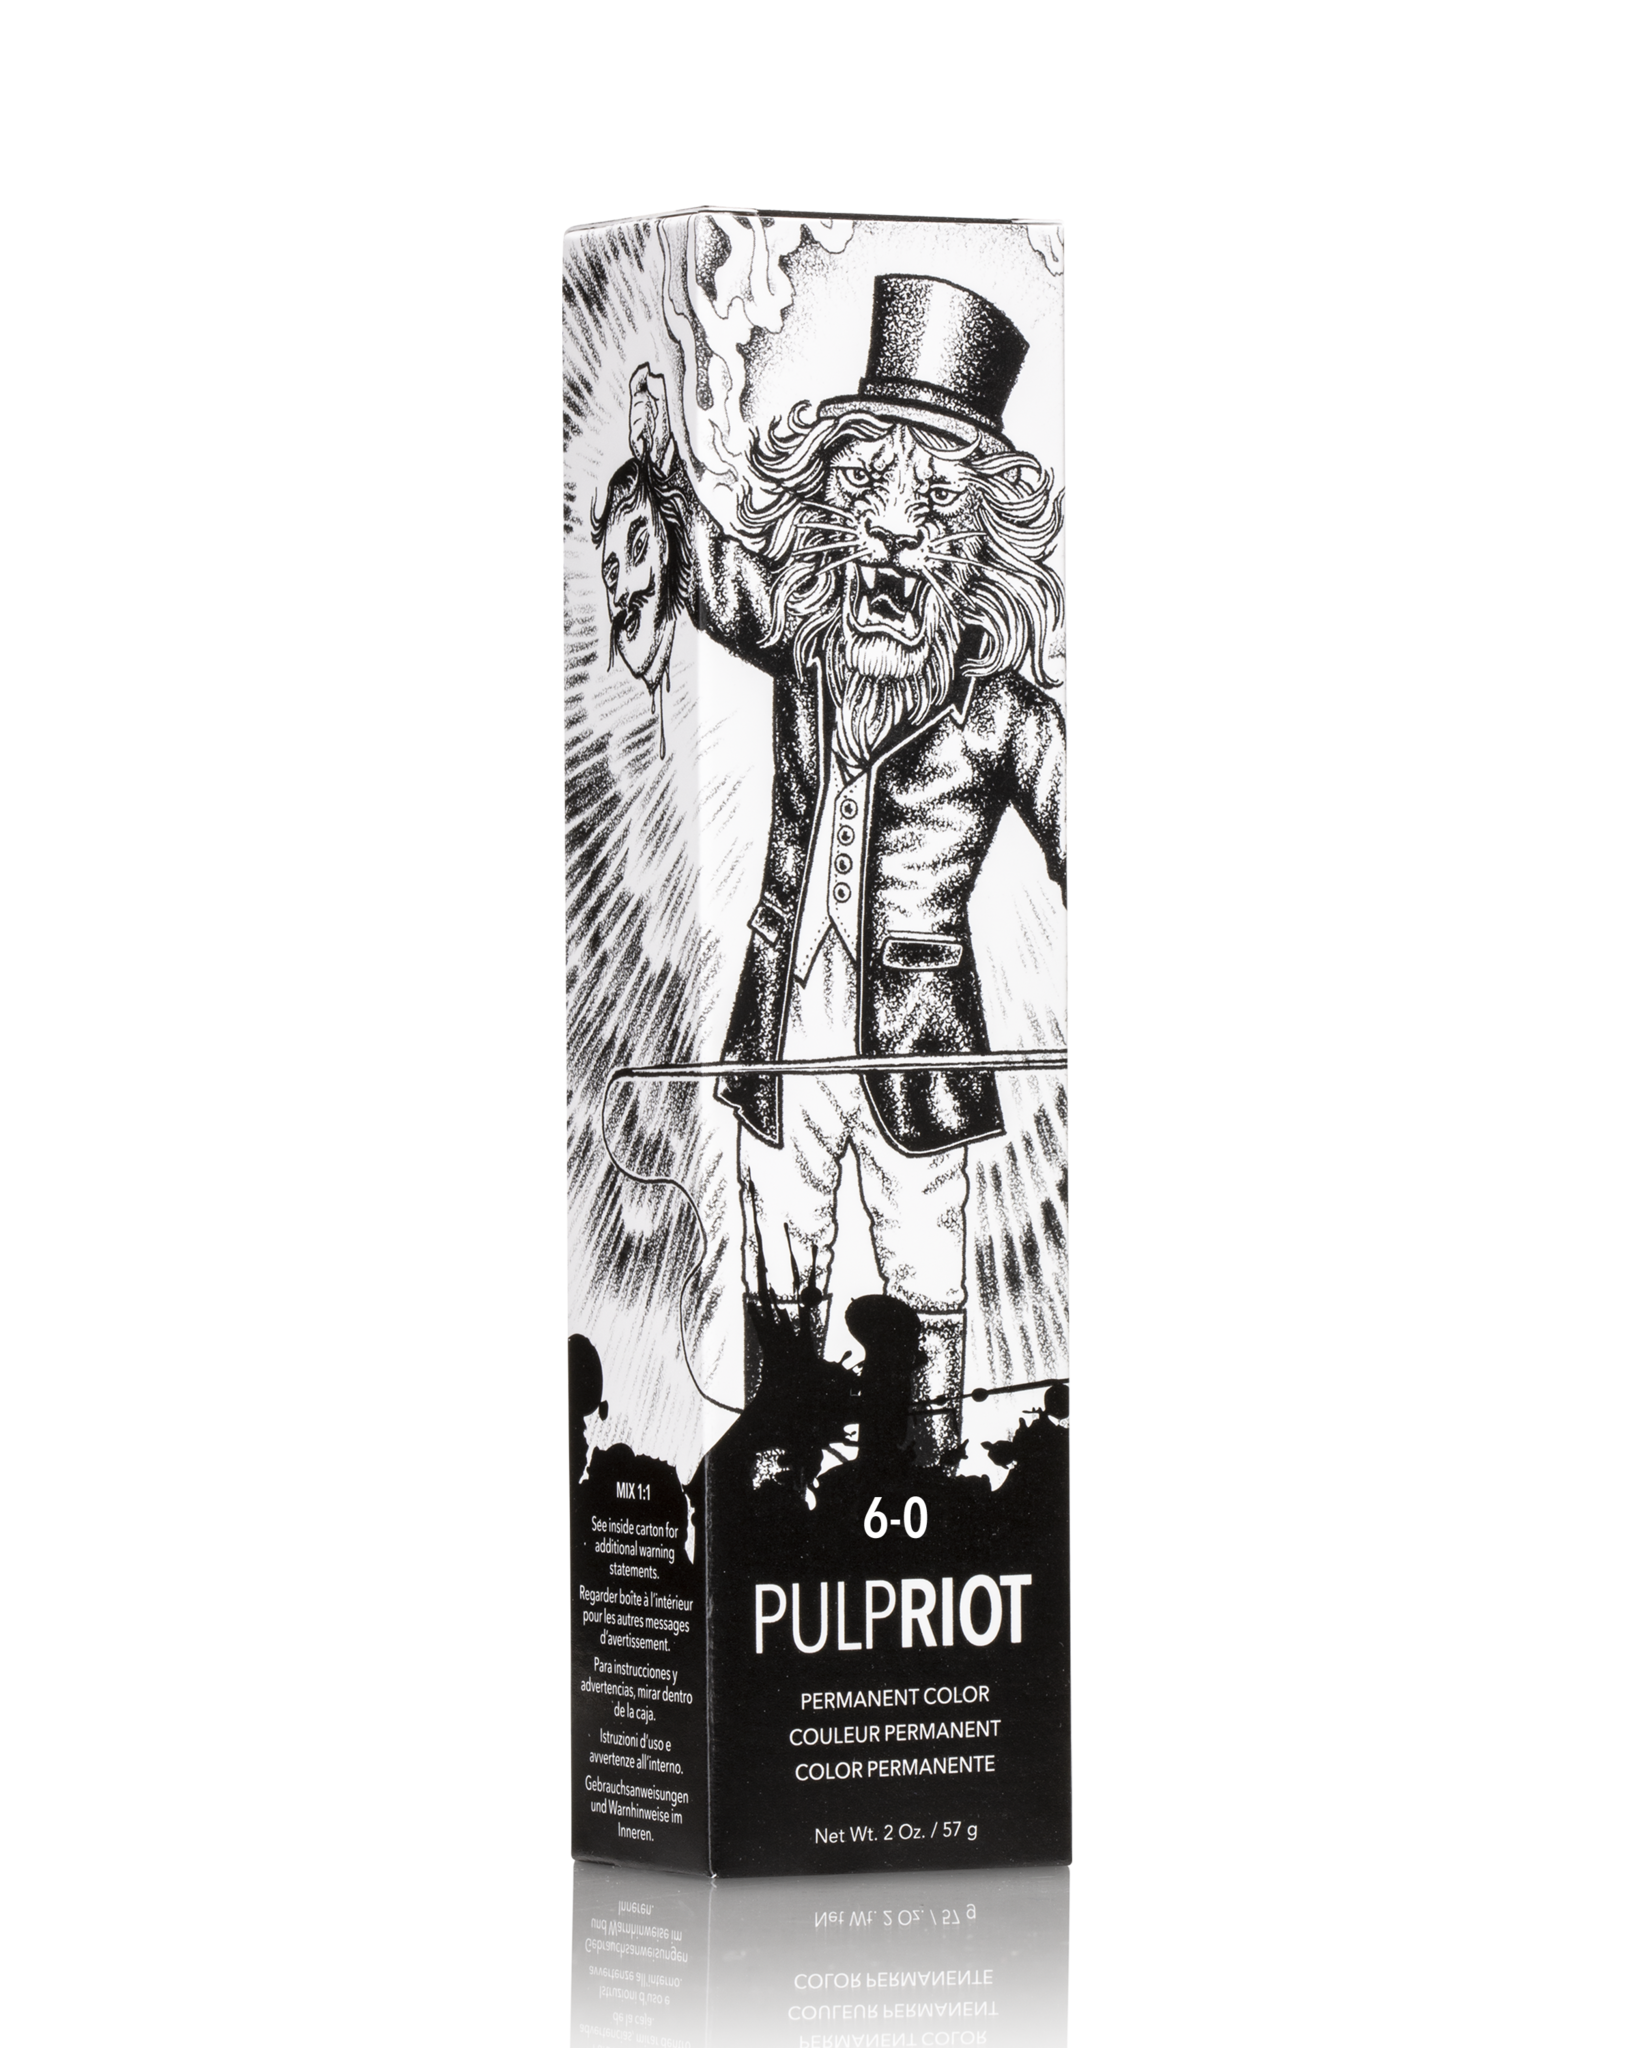 Pulp Riot PULP RIOT FACTION 8 NATUREL 6-0